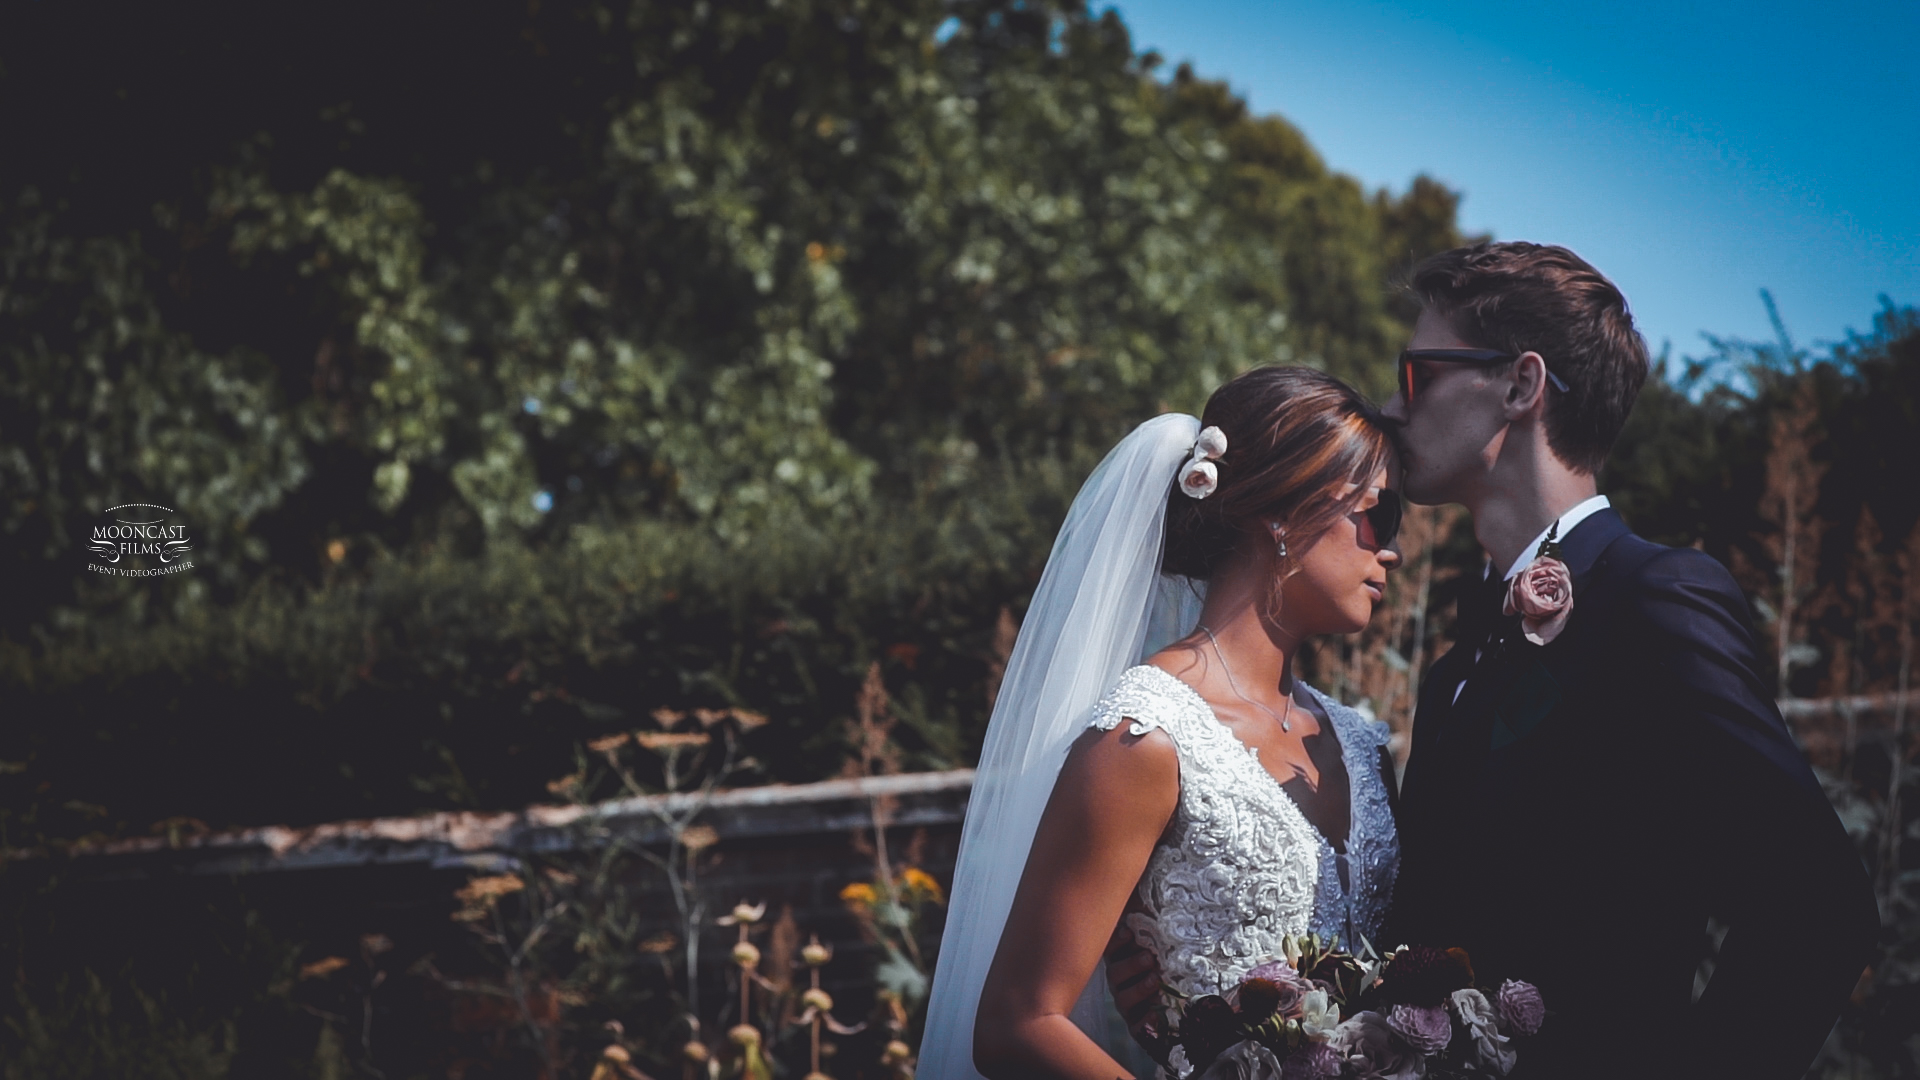 Wedding Videographers in London